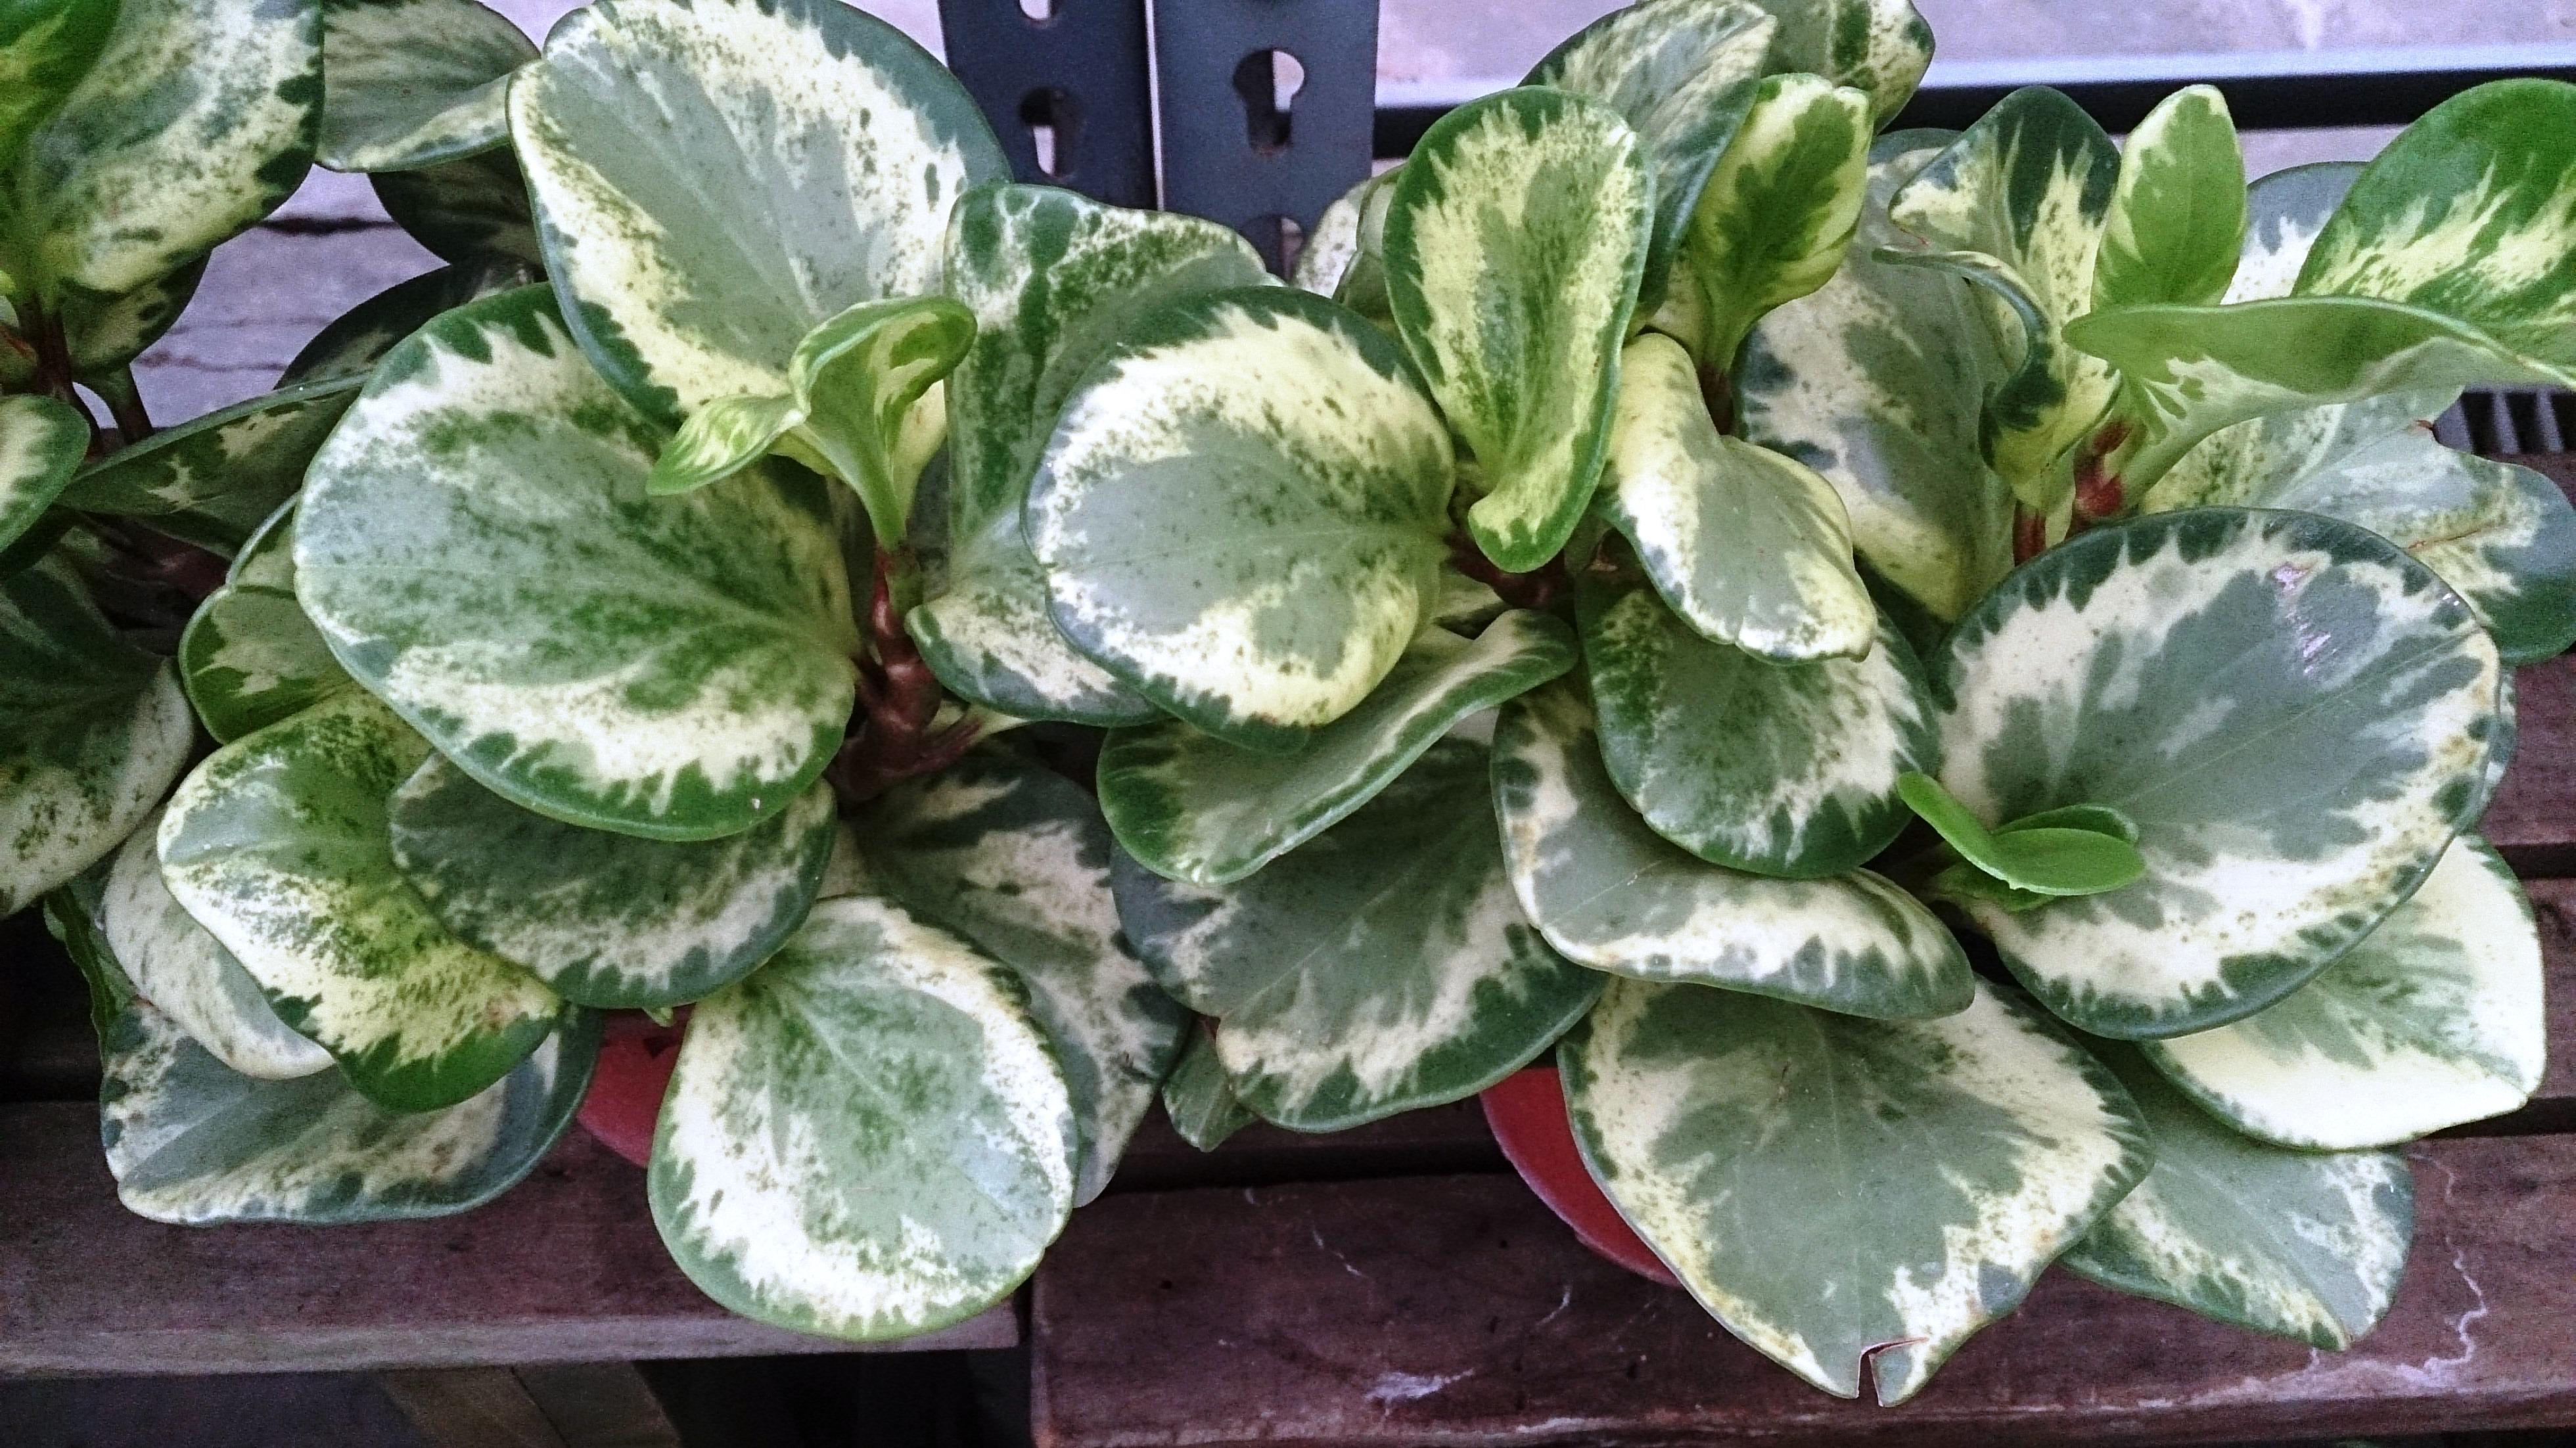 File:Baby Rubber Plant (Peperomia obtusifolia 'Variegata').jpg - Wikimedia  Commons